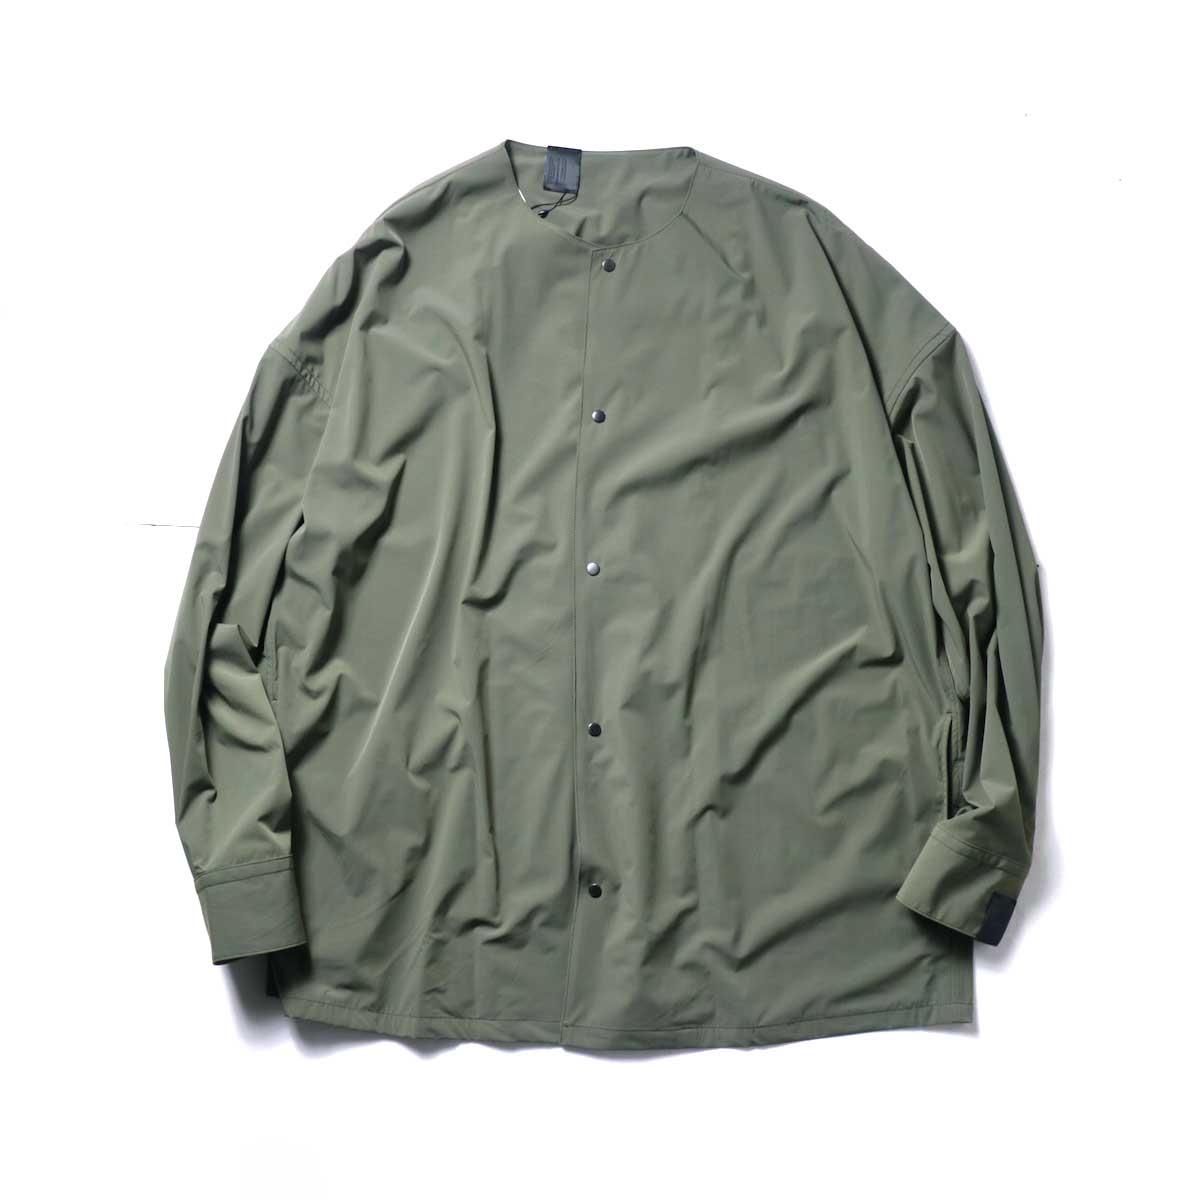 N.HOOLYWOOD / 2211-SH25-006 peg Collarless Shirt (Khaki)正面